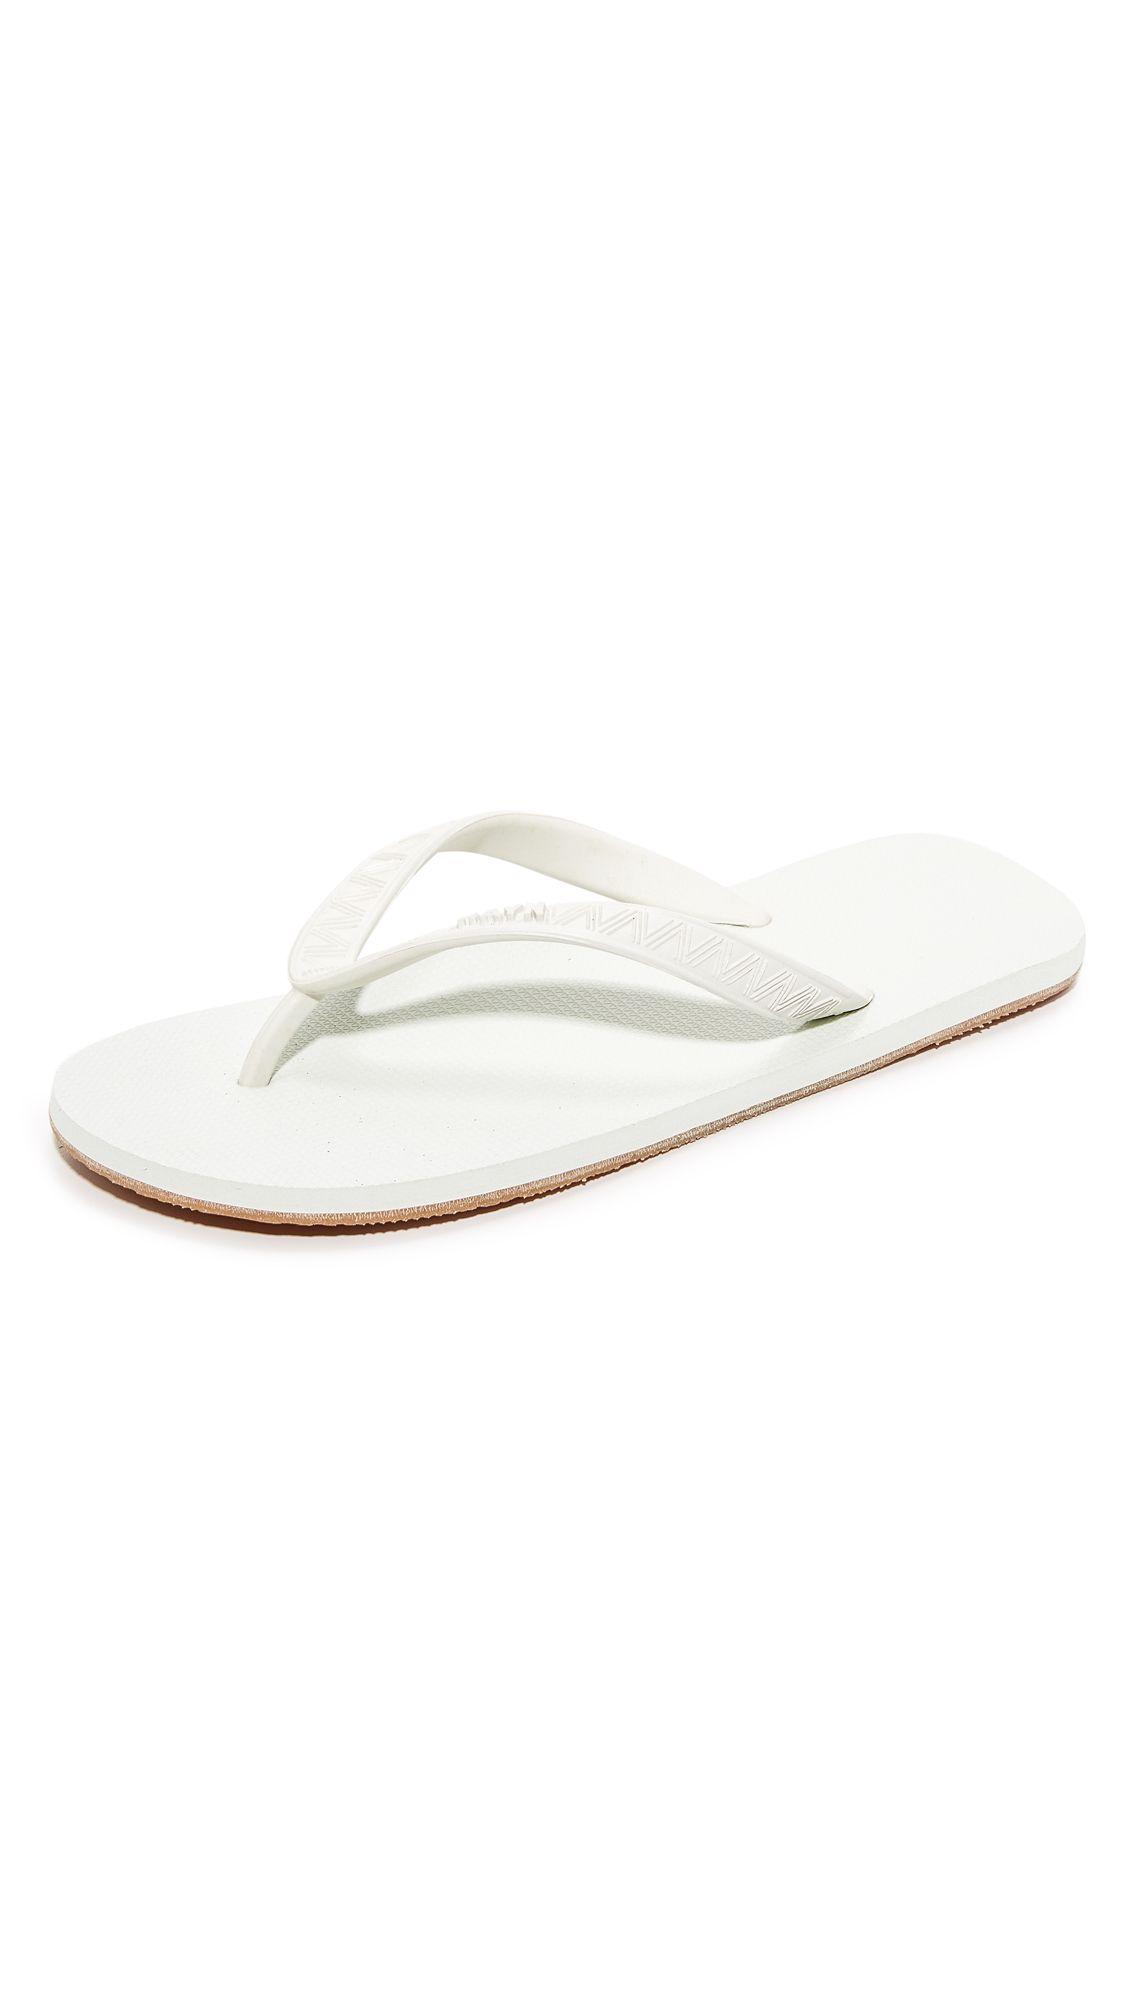 5afed25c3282 HAYN HAUPIA SANDAL.  hayn  shoes